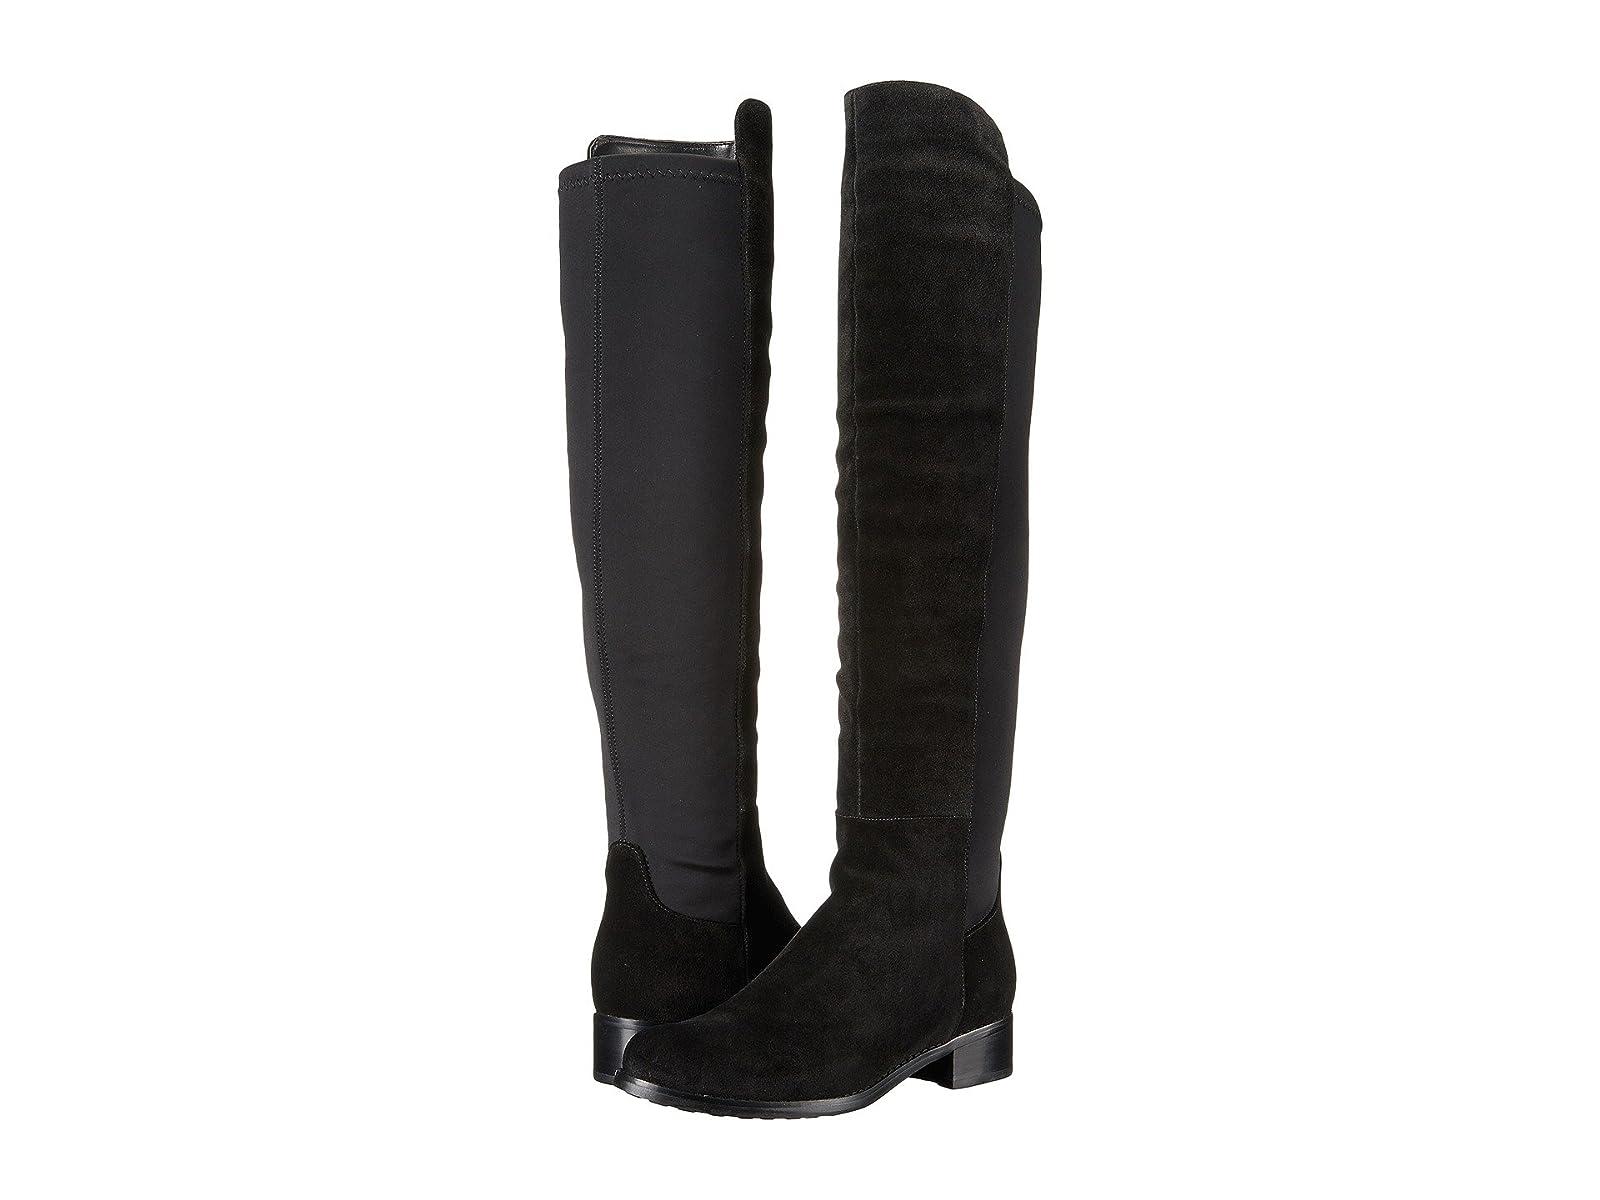 Blondo Velma Waterproof BootSelling fashionable and eye-catching shoes